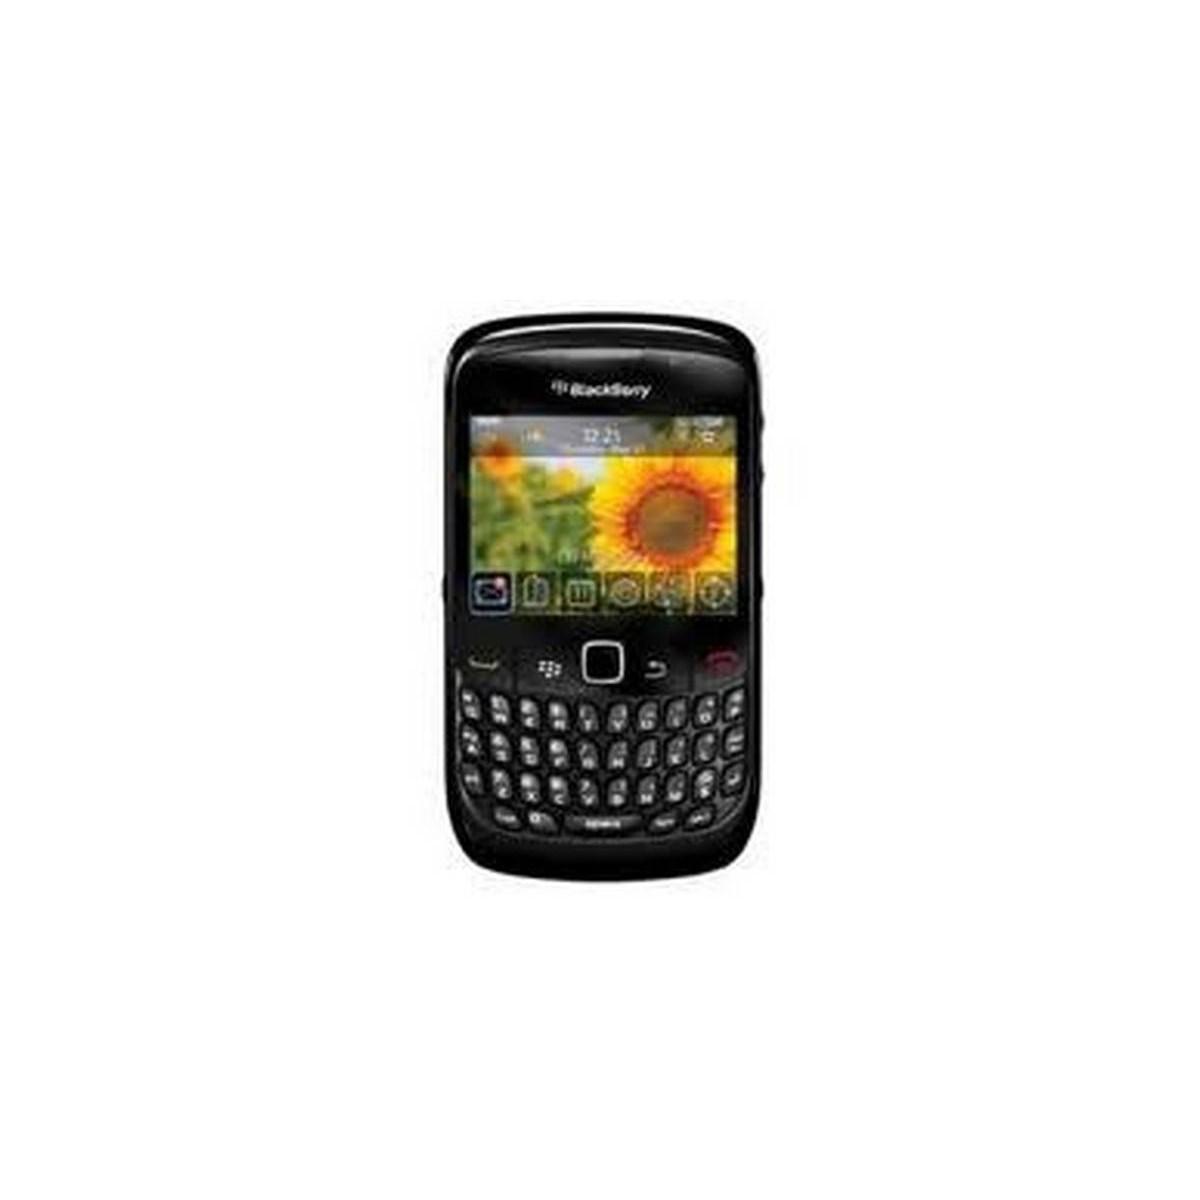 Blackberry 8520, carcasa negra